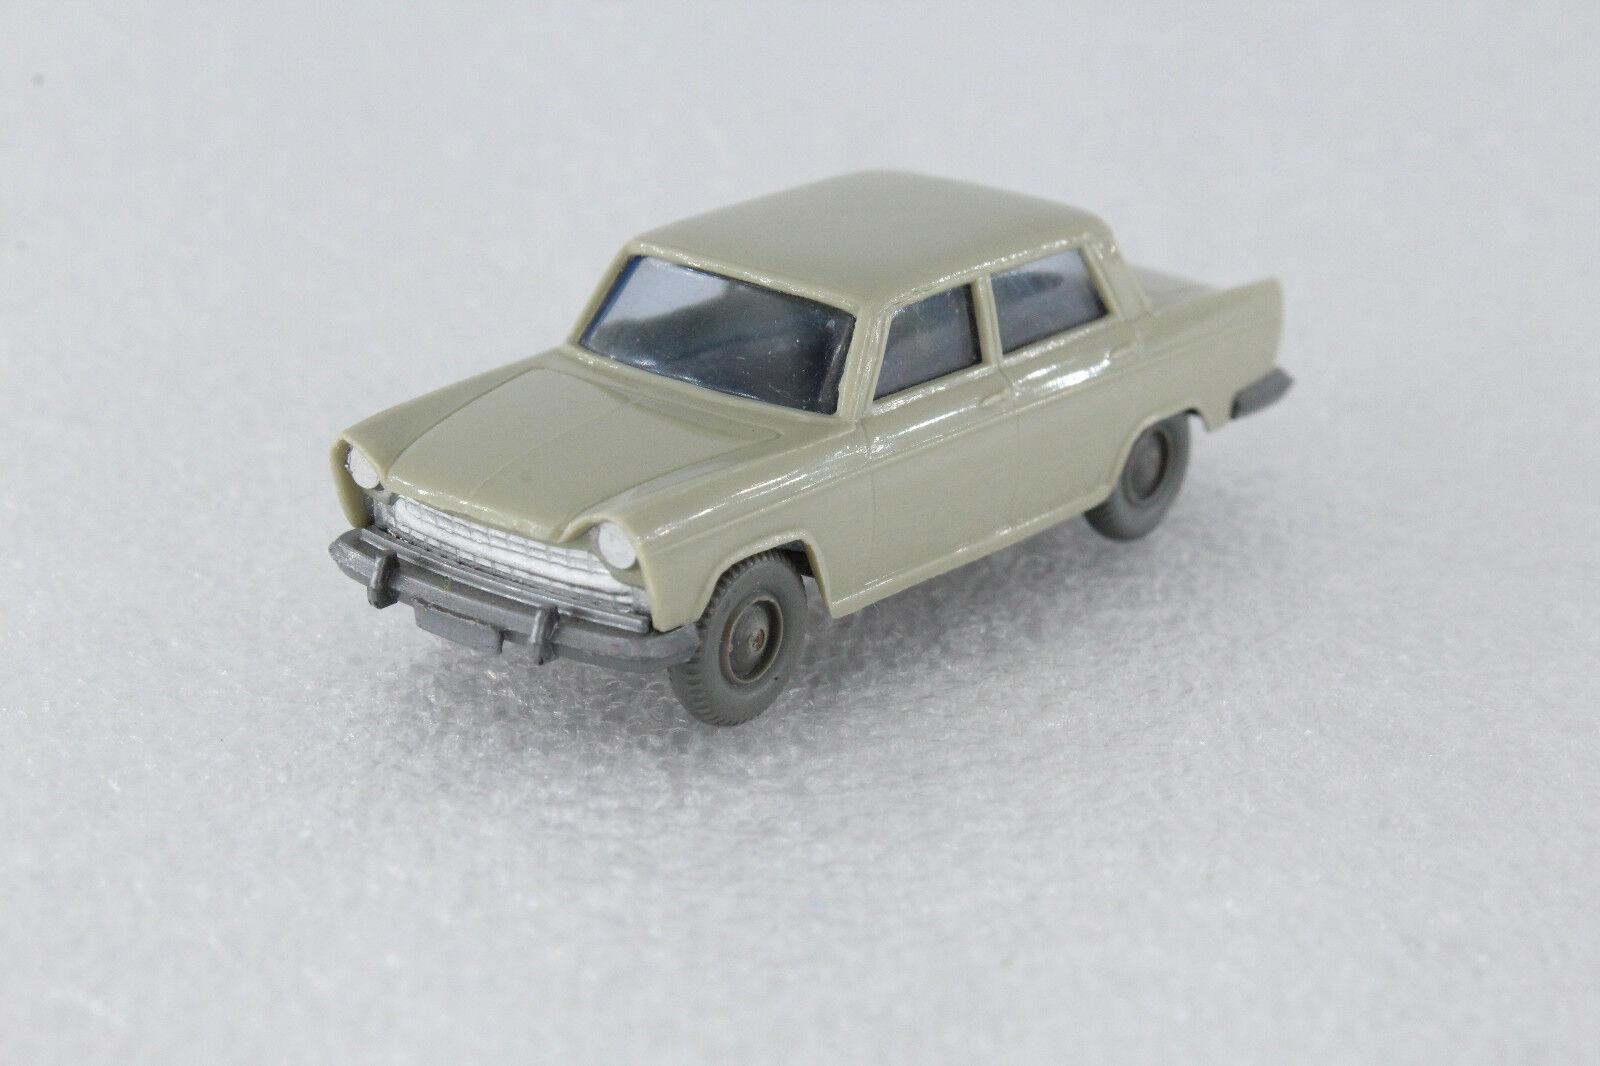 A.s.s Wiking Old Cars Fiat 1800 GREENISH BEIGE 1962 GK 90 3D CS 460 1A Top